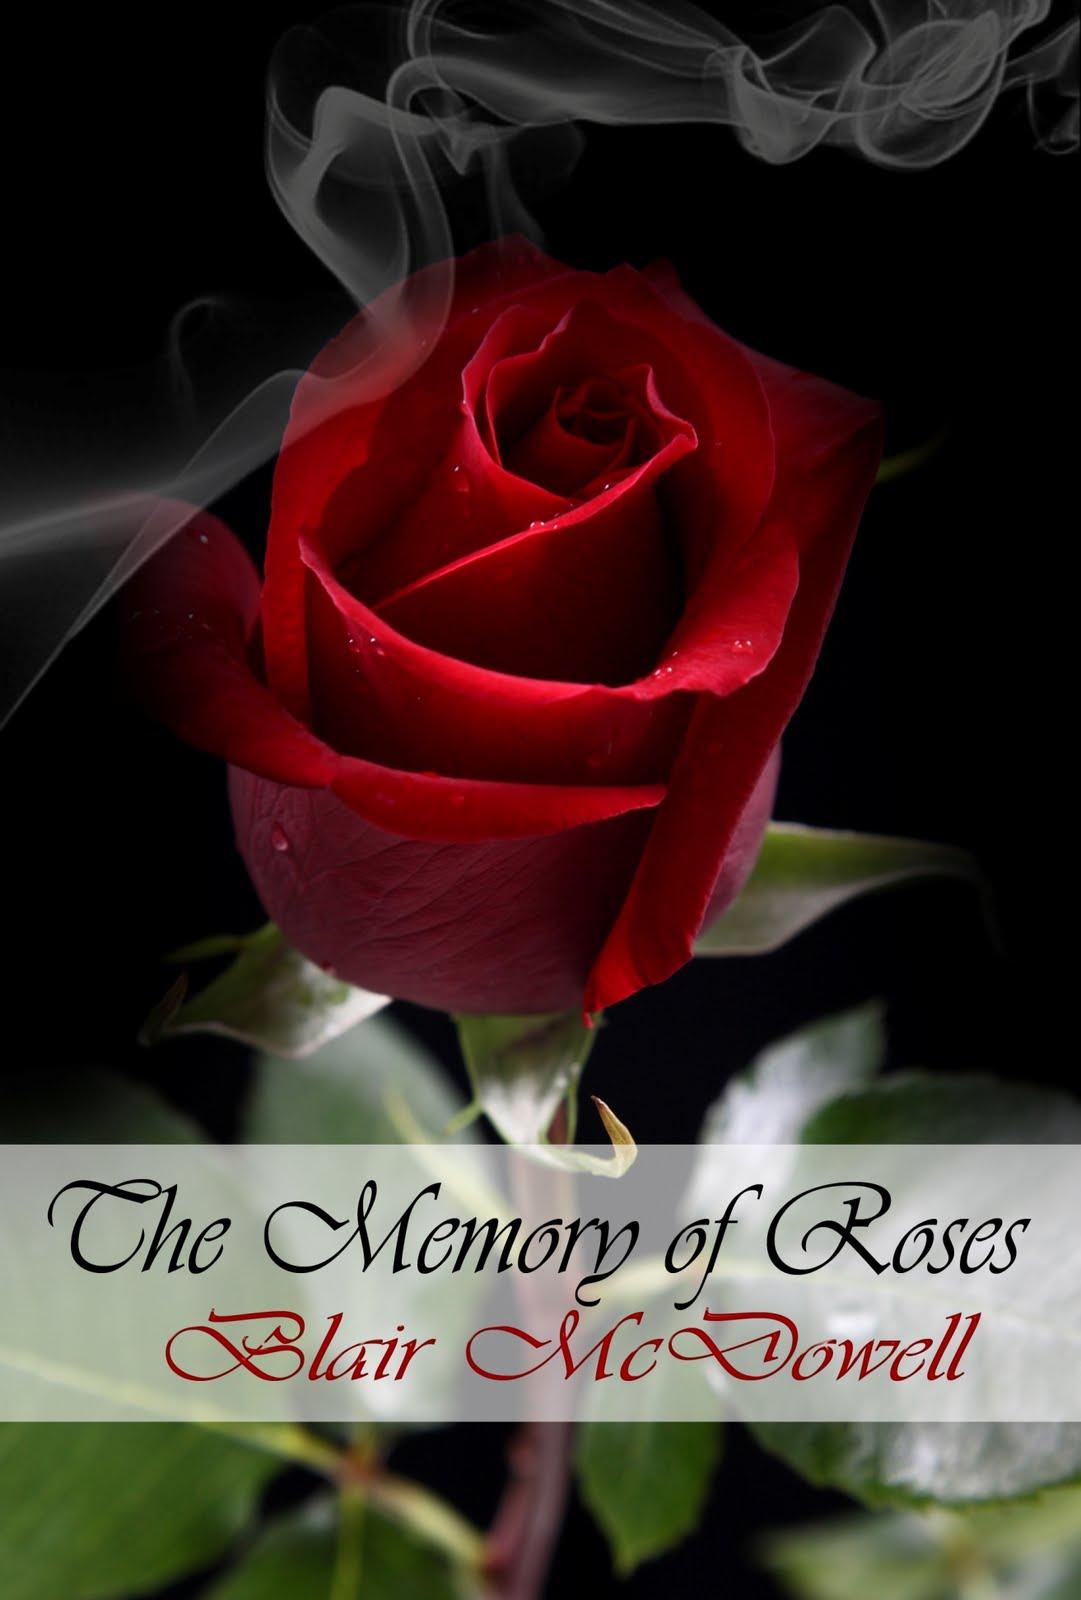 http://www.blairmcdowell.com/Memory_of_Roses.html